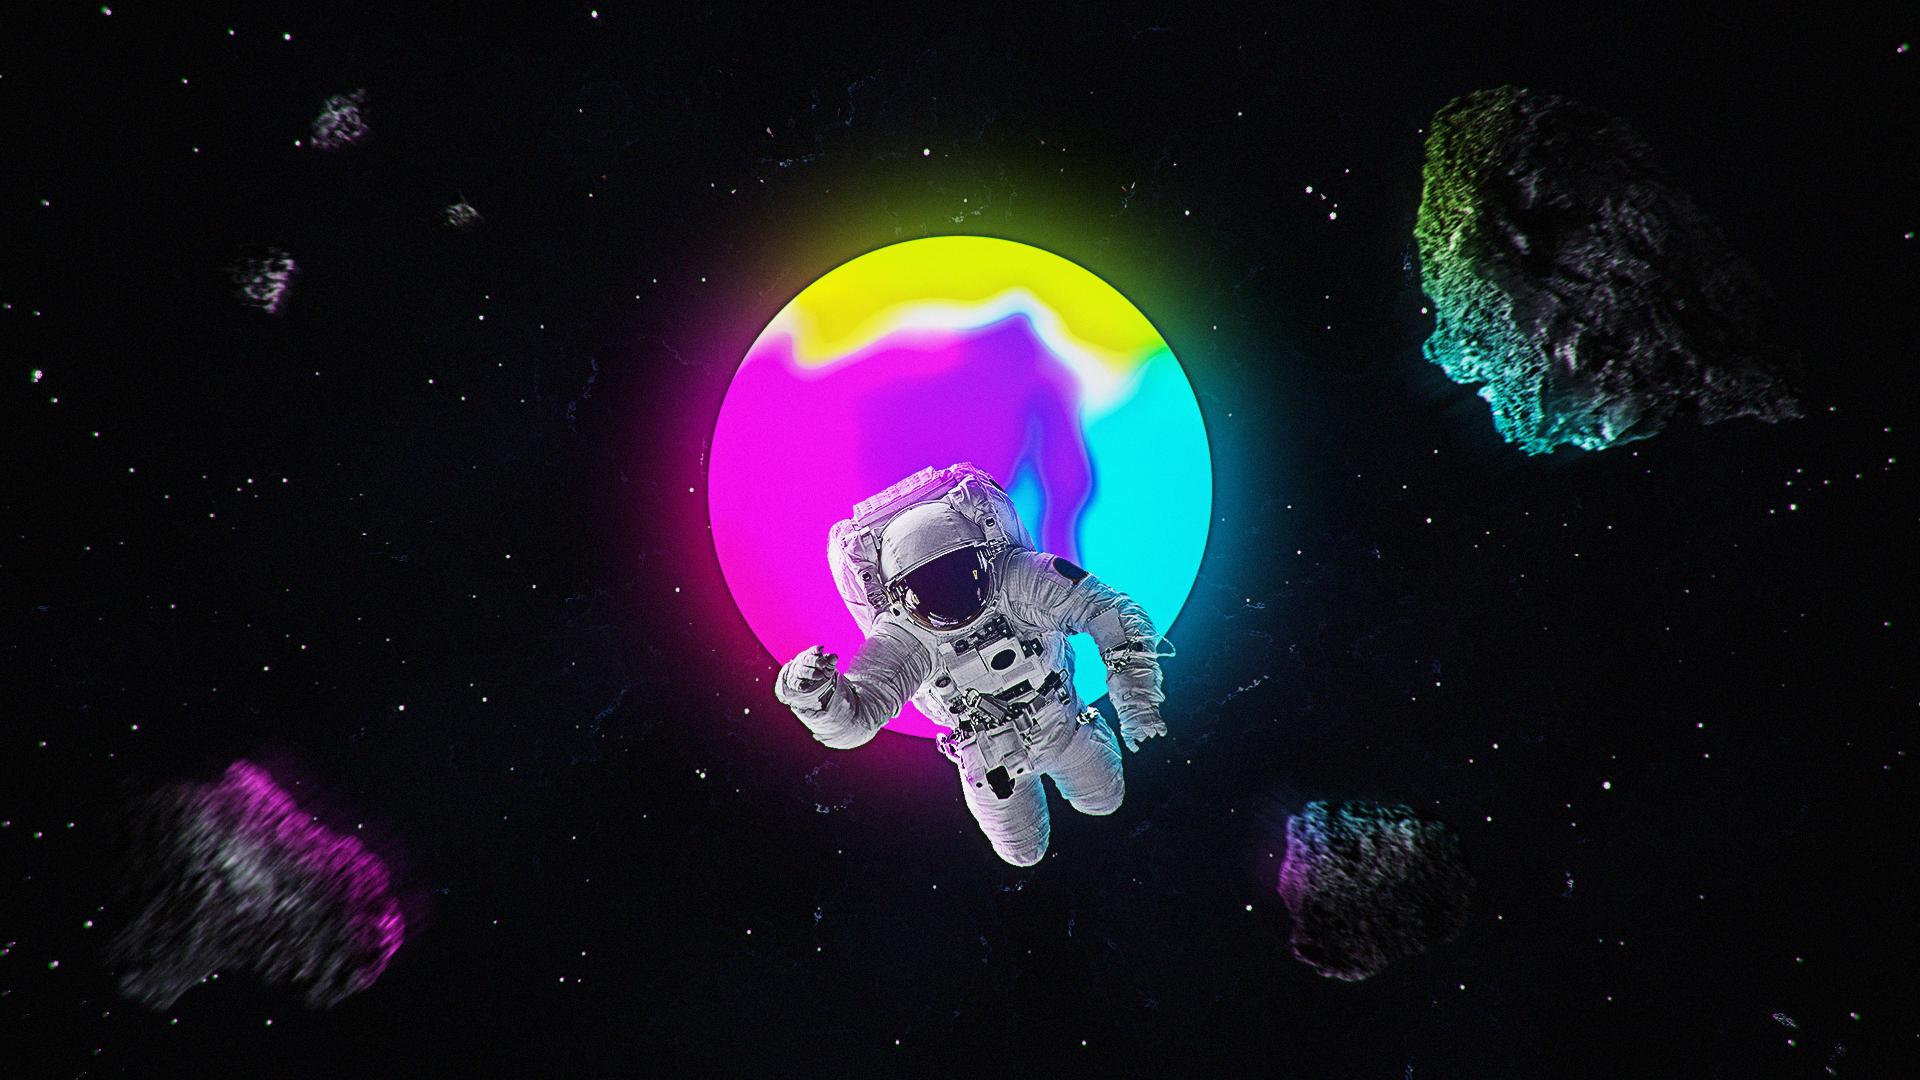 Wallpaper Digital Art Abstract Gradient Astronaut Galaxy